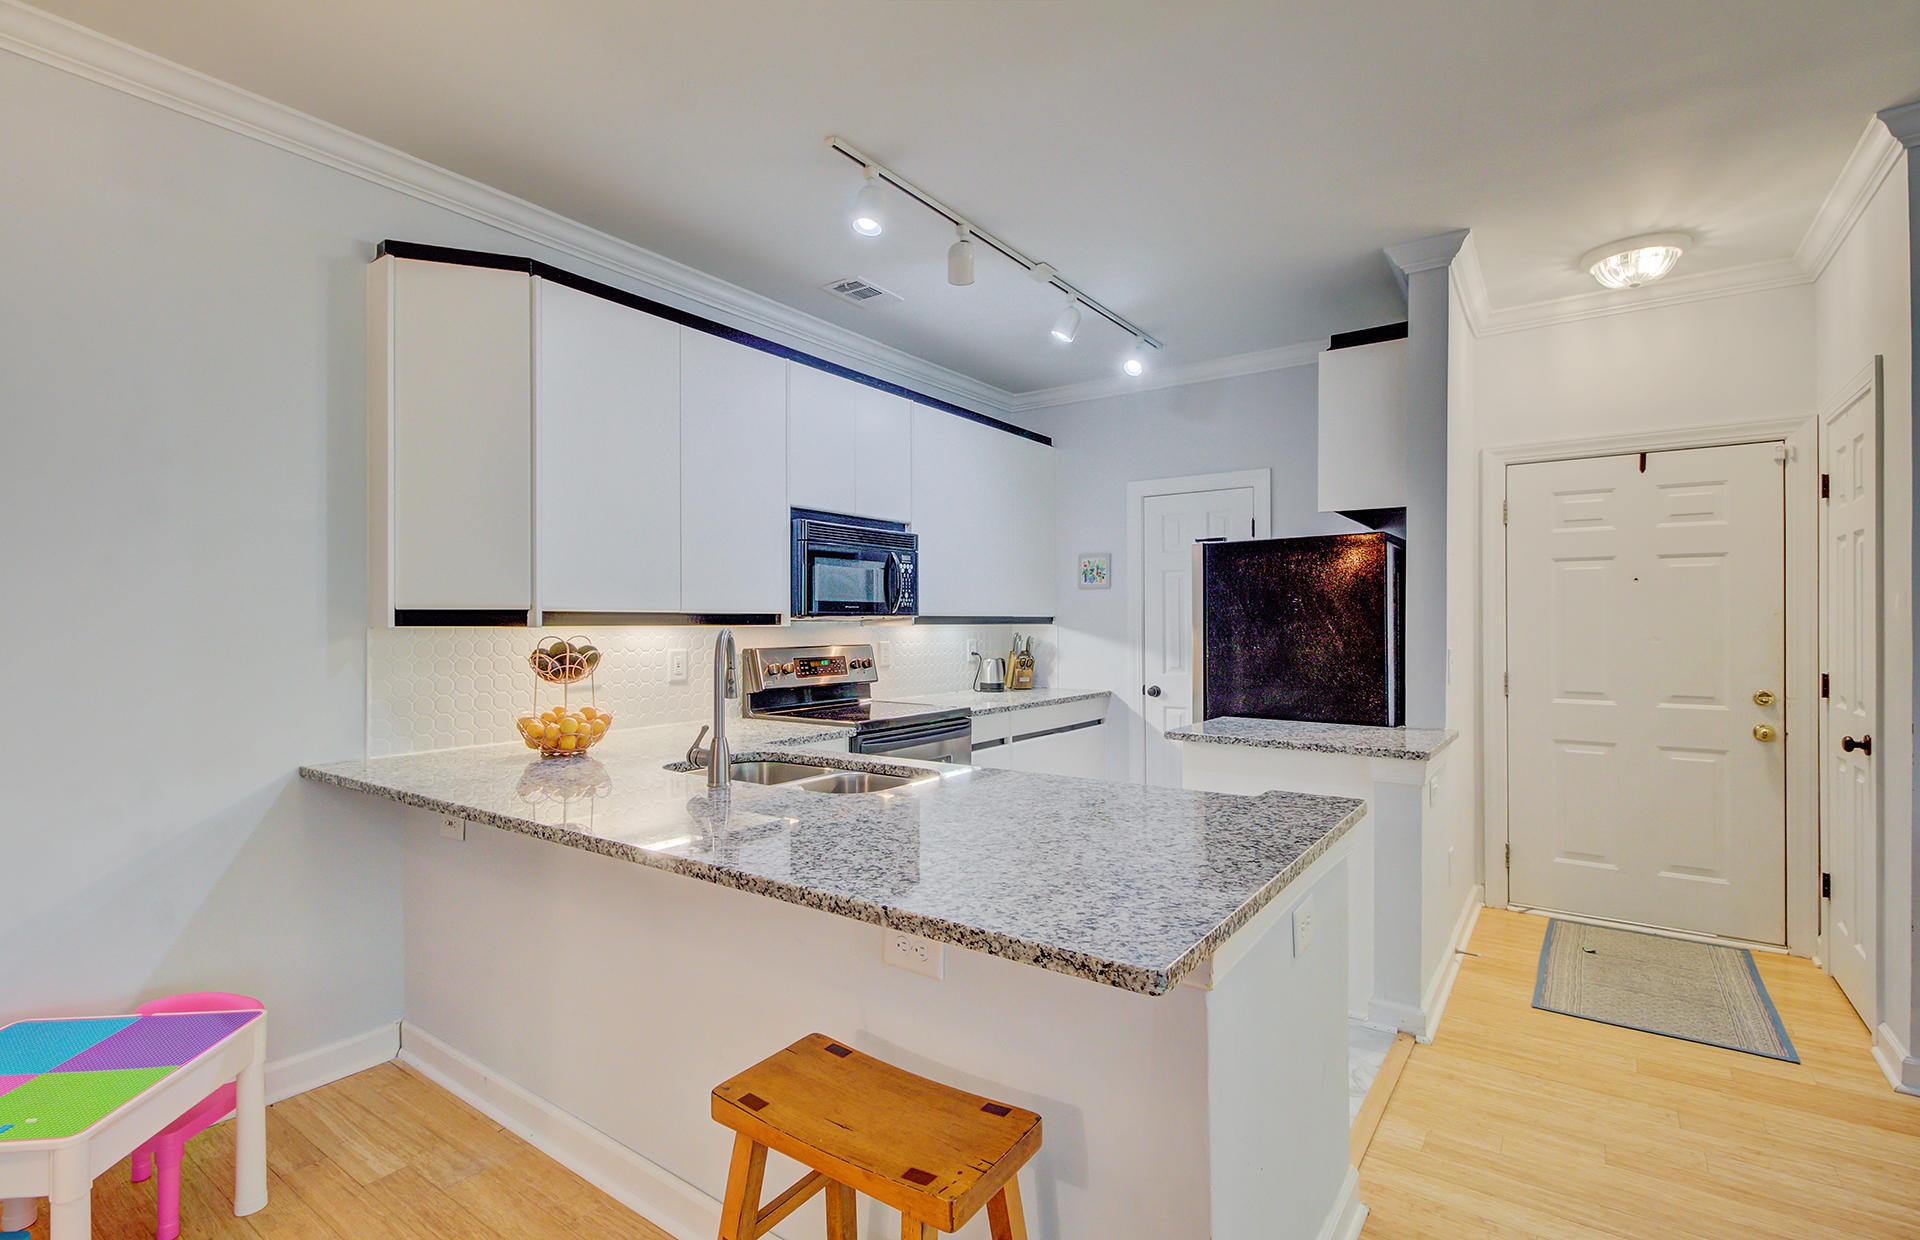 Dunes West Homes For Sale - 1566 Oxborough, Mount Pleasant, SC - 29